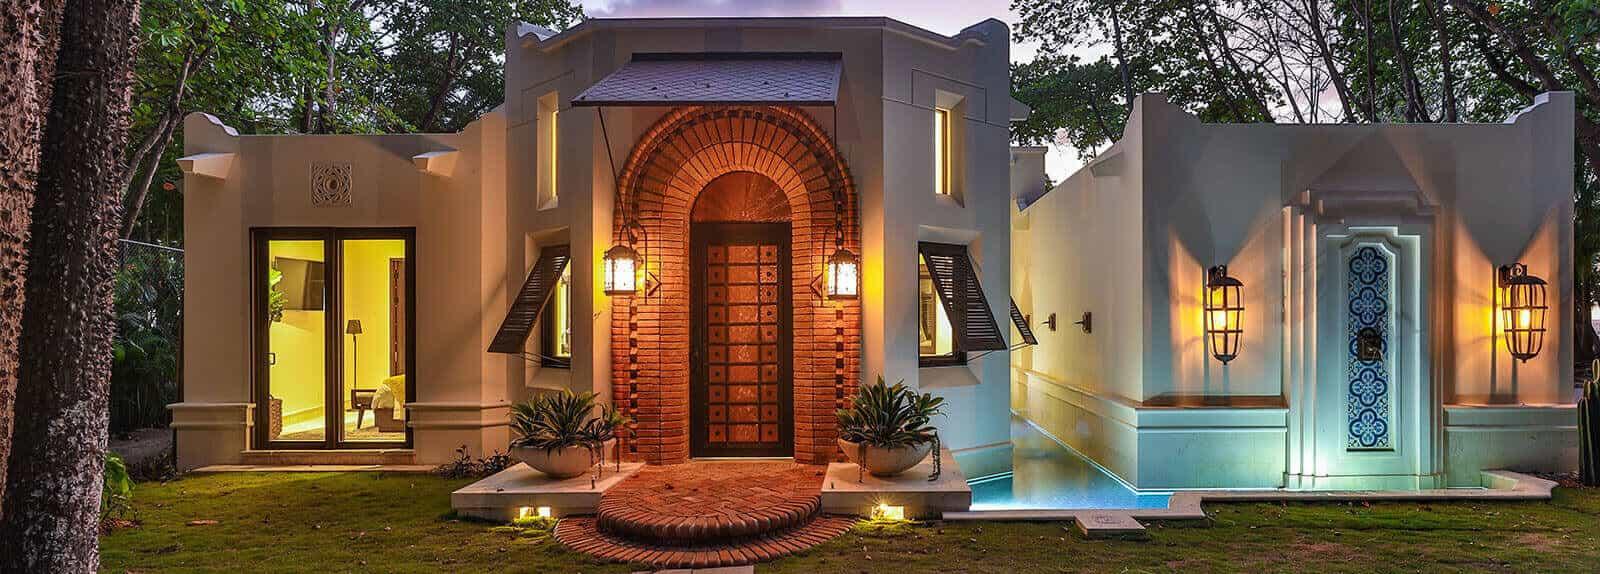 CasaTeresa Luxury Villa Front view Large